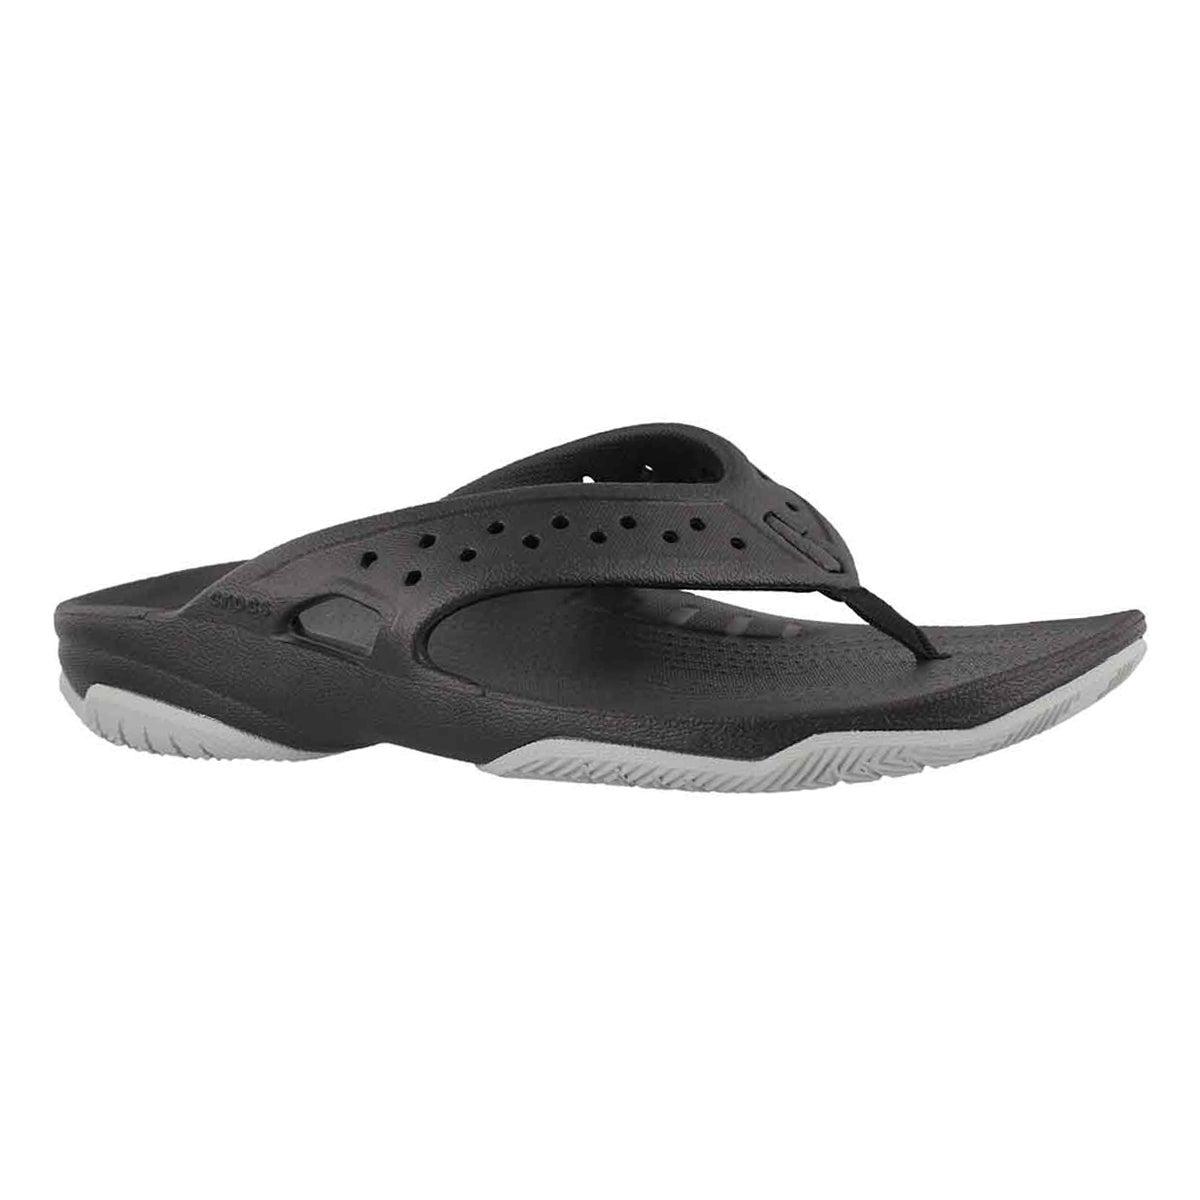 Men's SWIFTWATER DECK FLIP blk/gry sandals